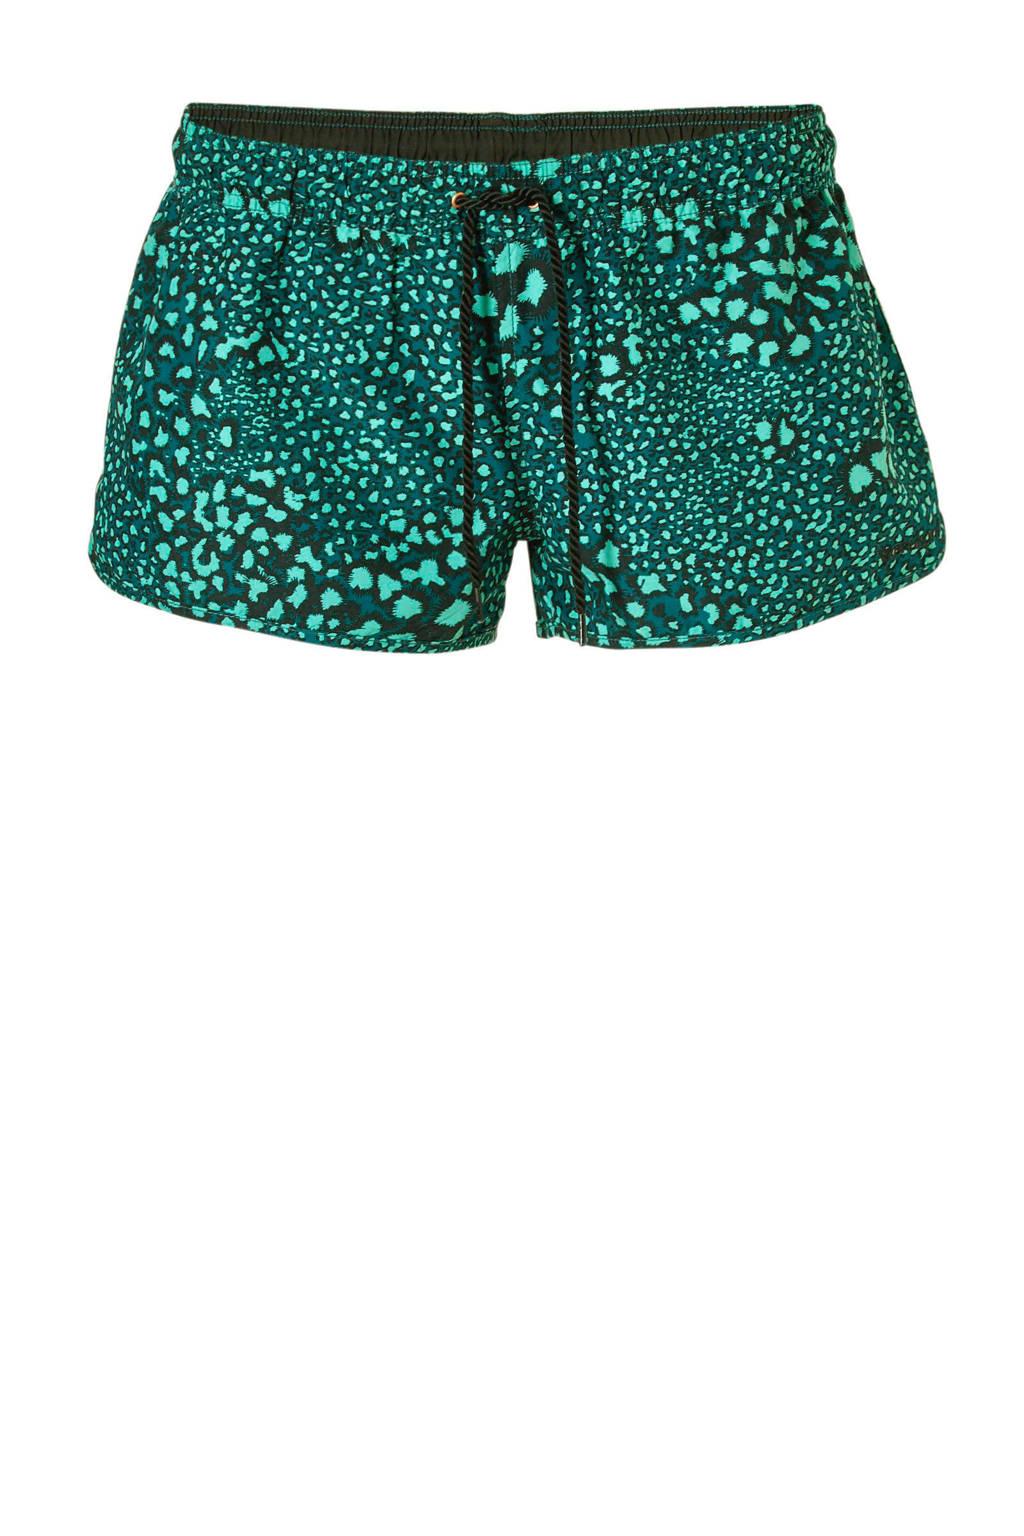 Brunotti zwemshort met all over print groen, Groen